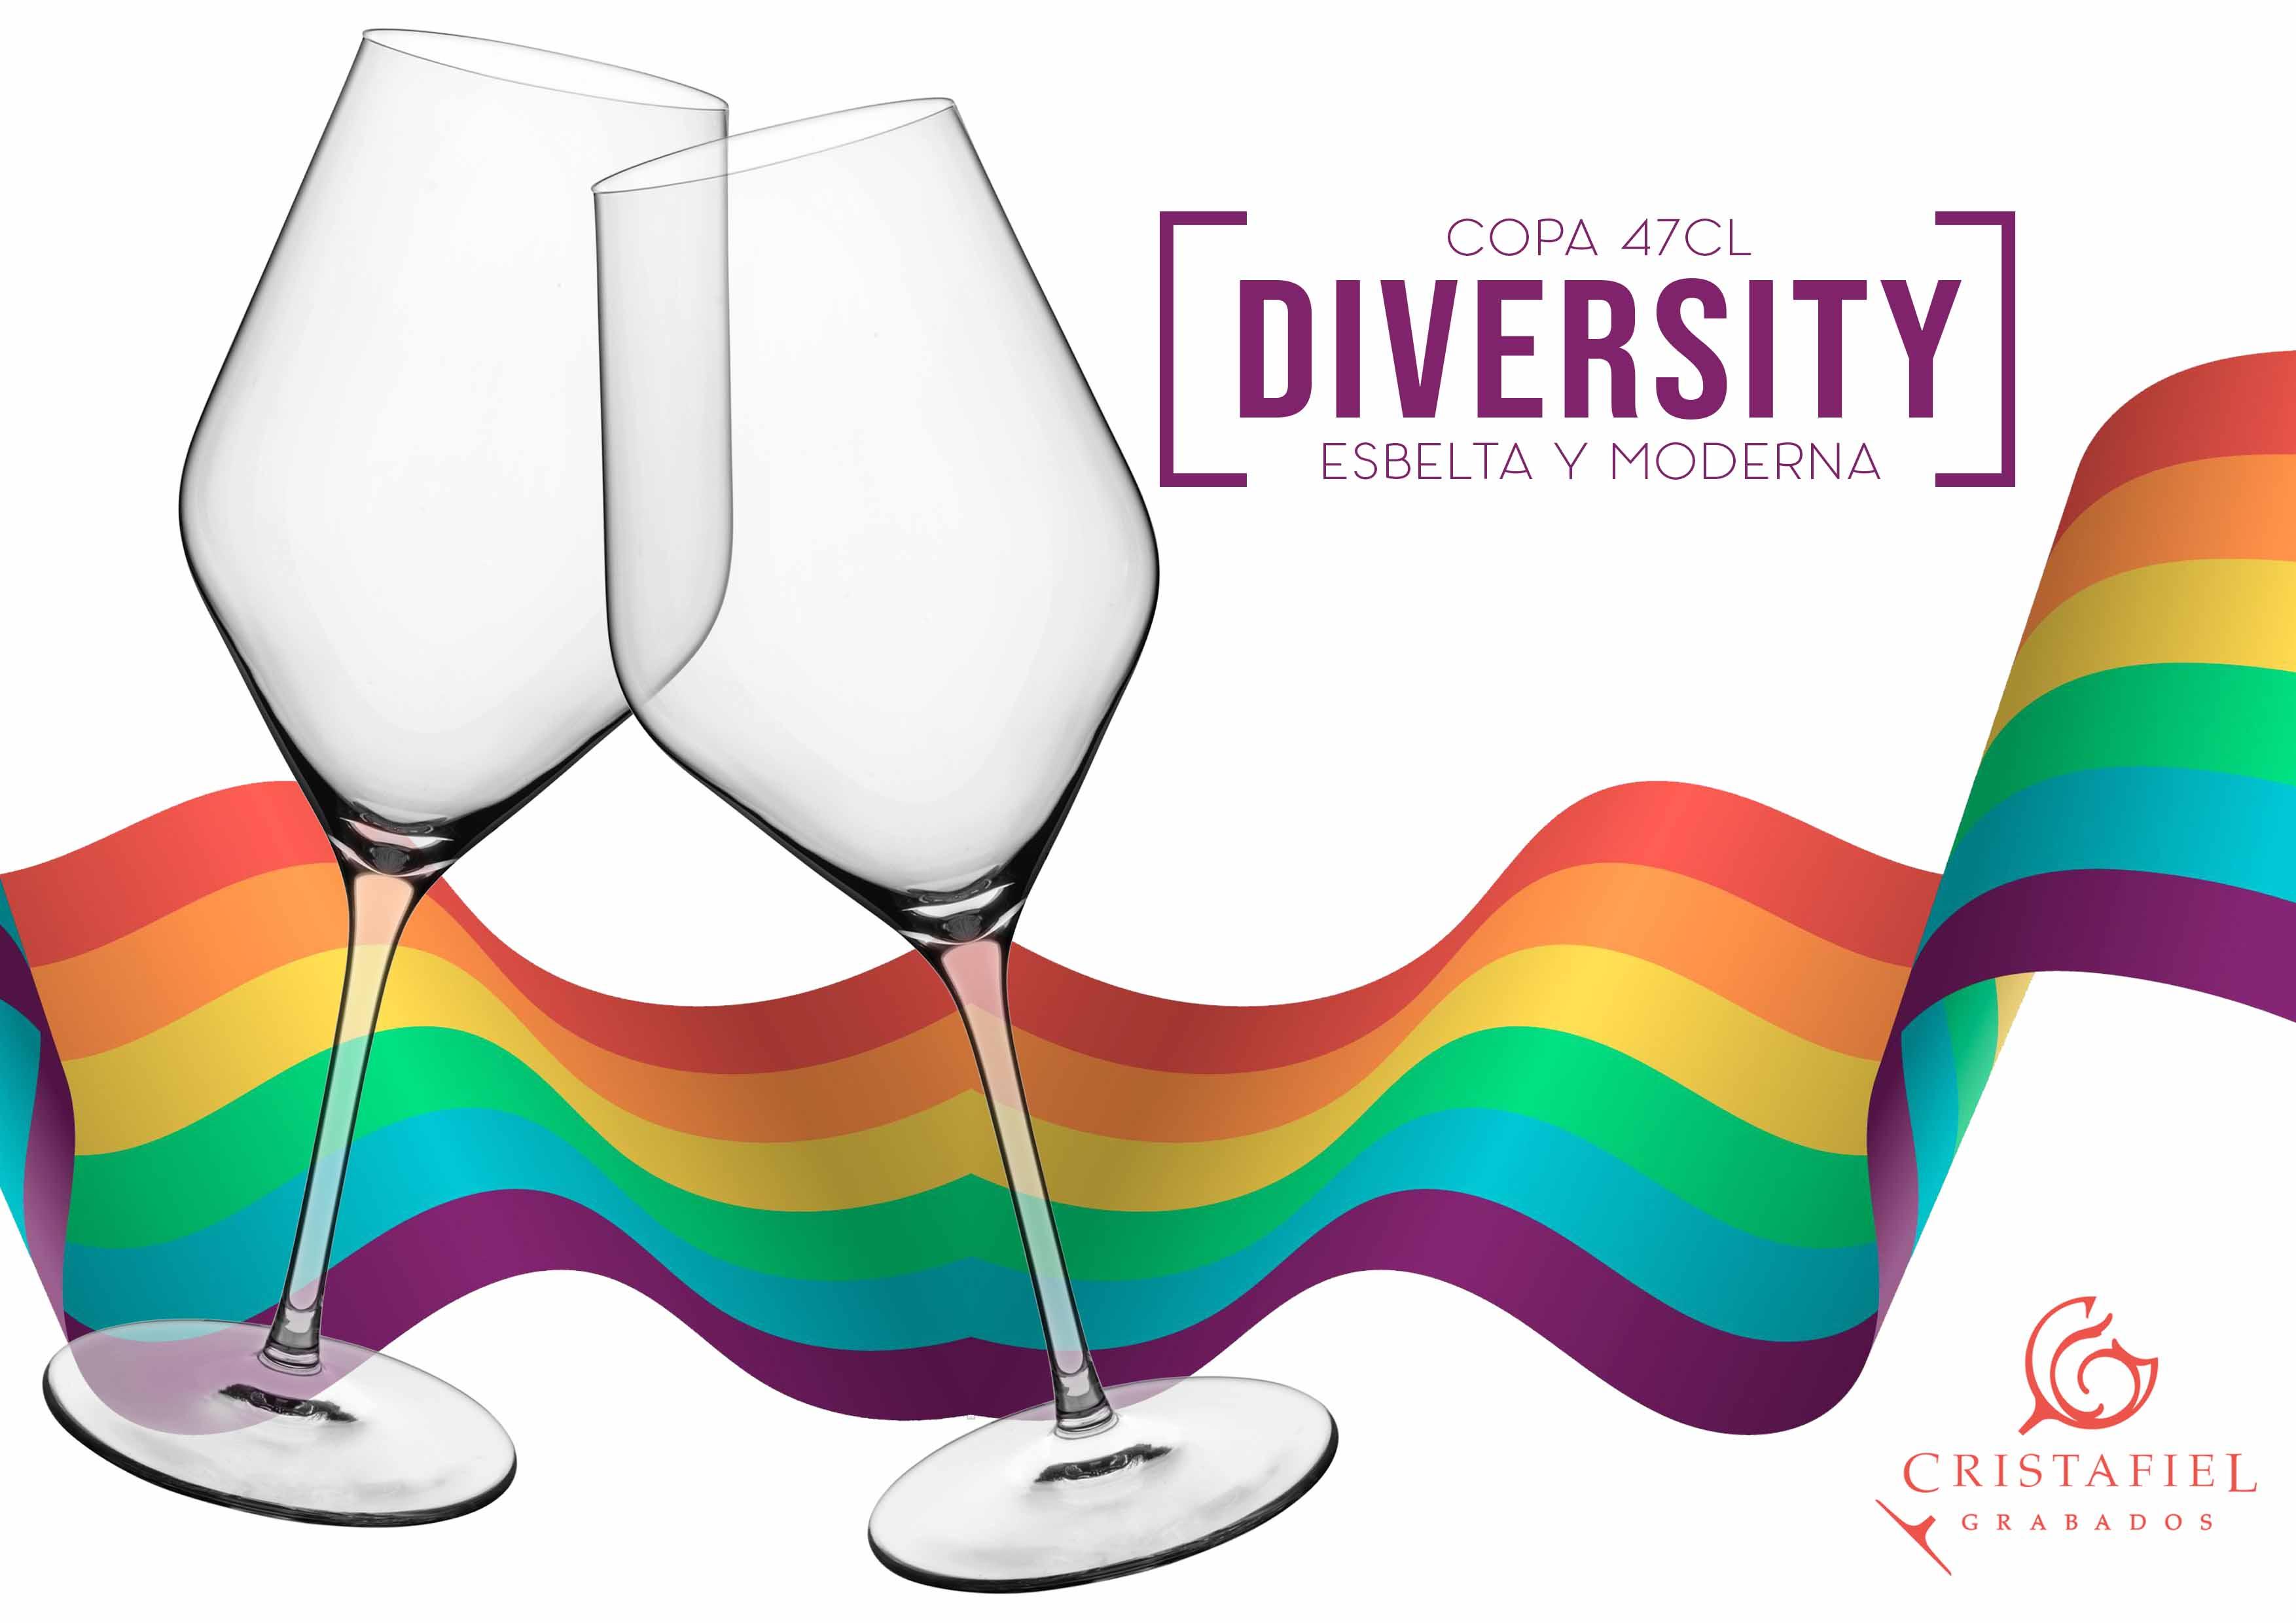 Copa Diversity 47cl Grabados Cristafiel